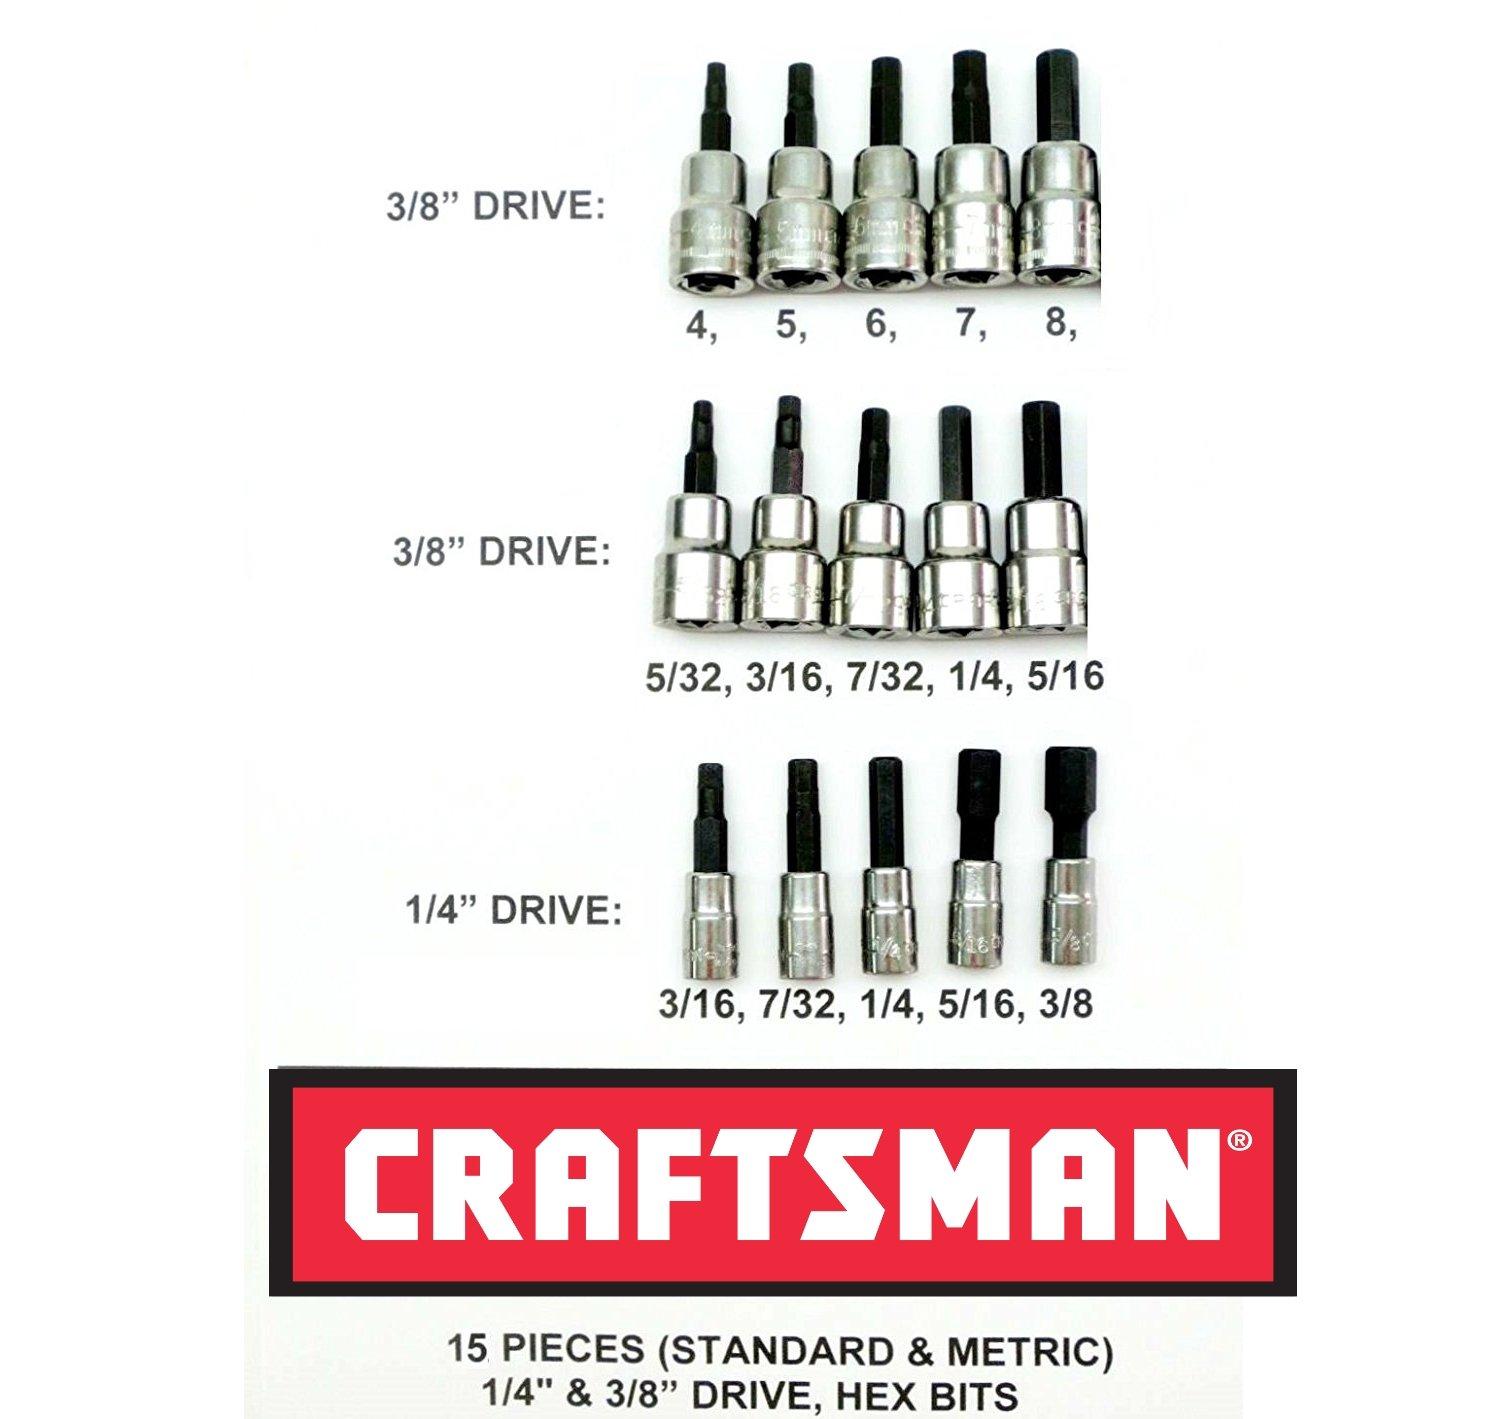 Craftsman 15 Piece 3/8' & 1/4' Drive Hex Bit Allen Socket Set